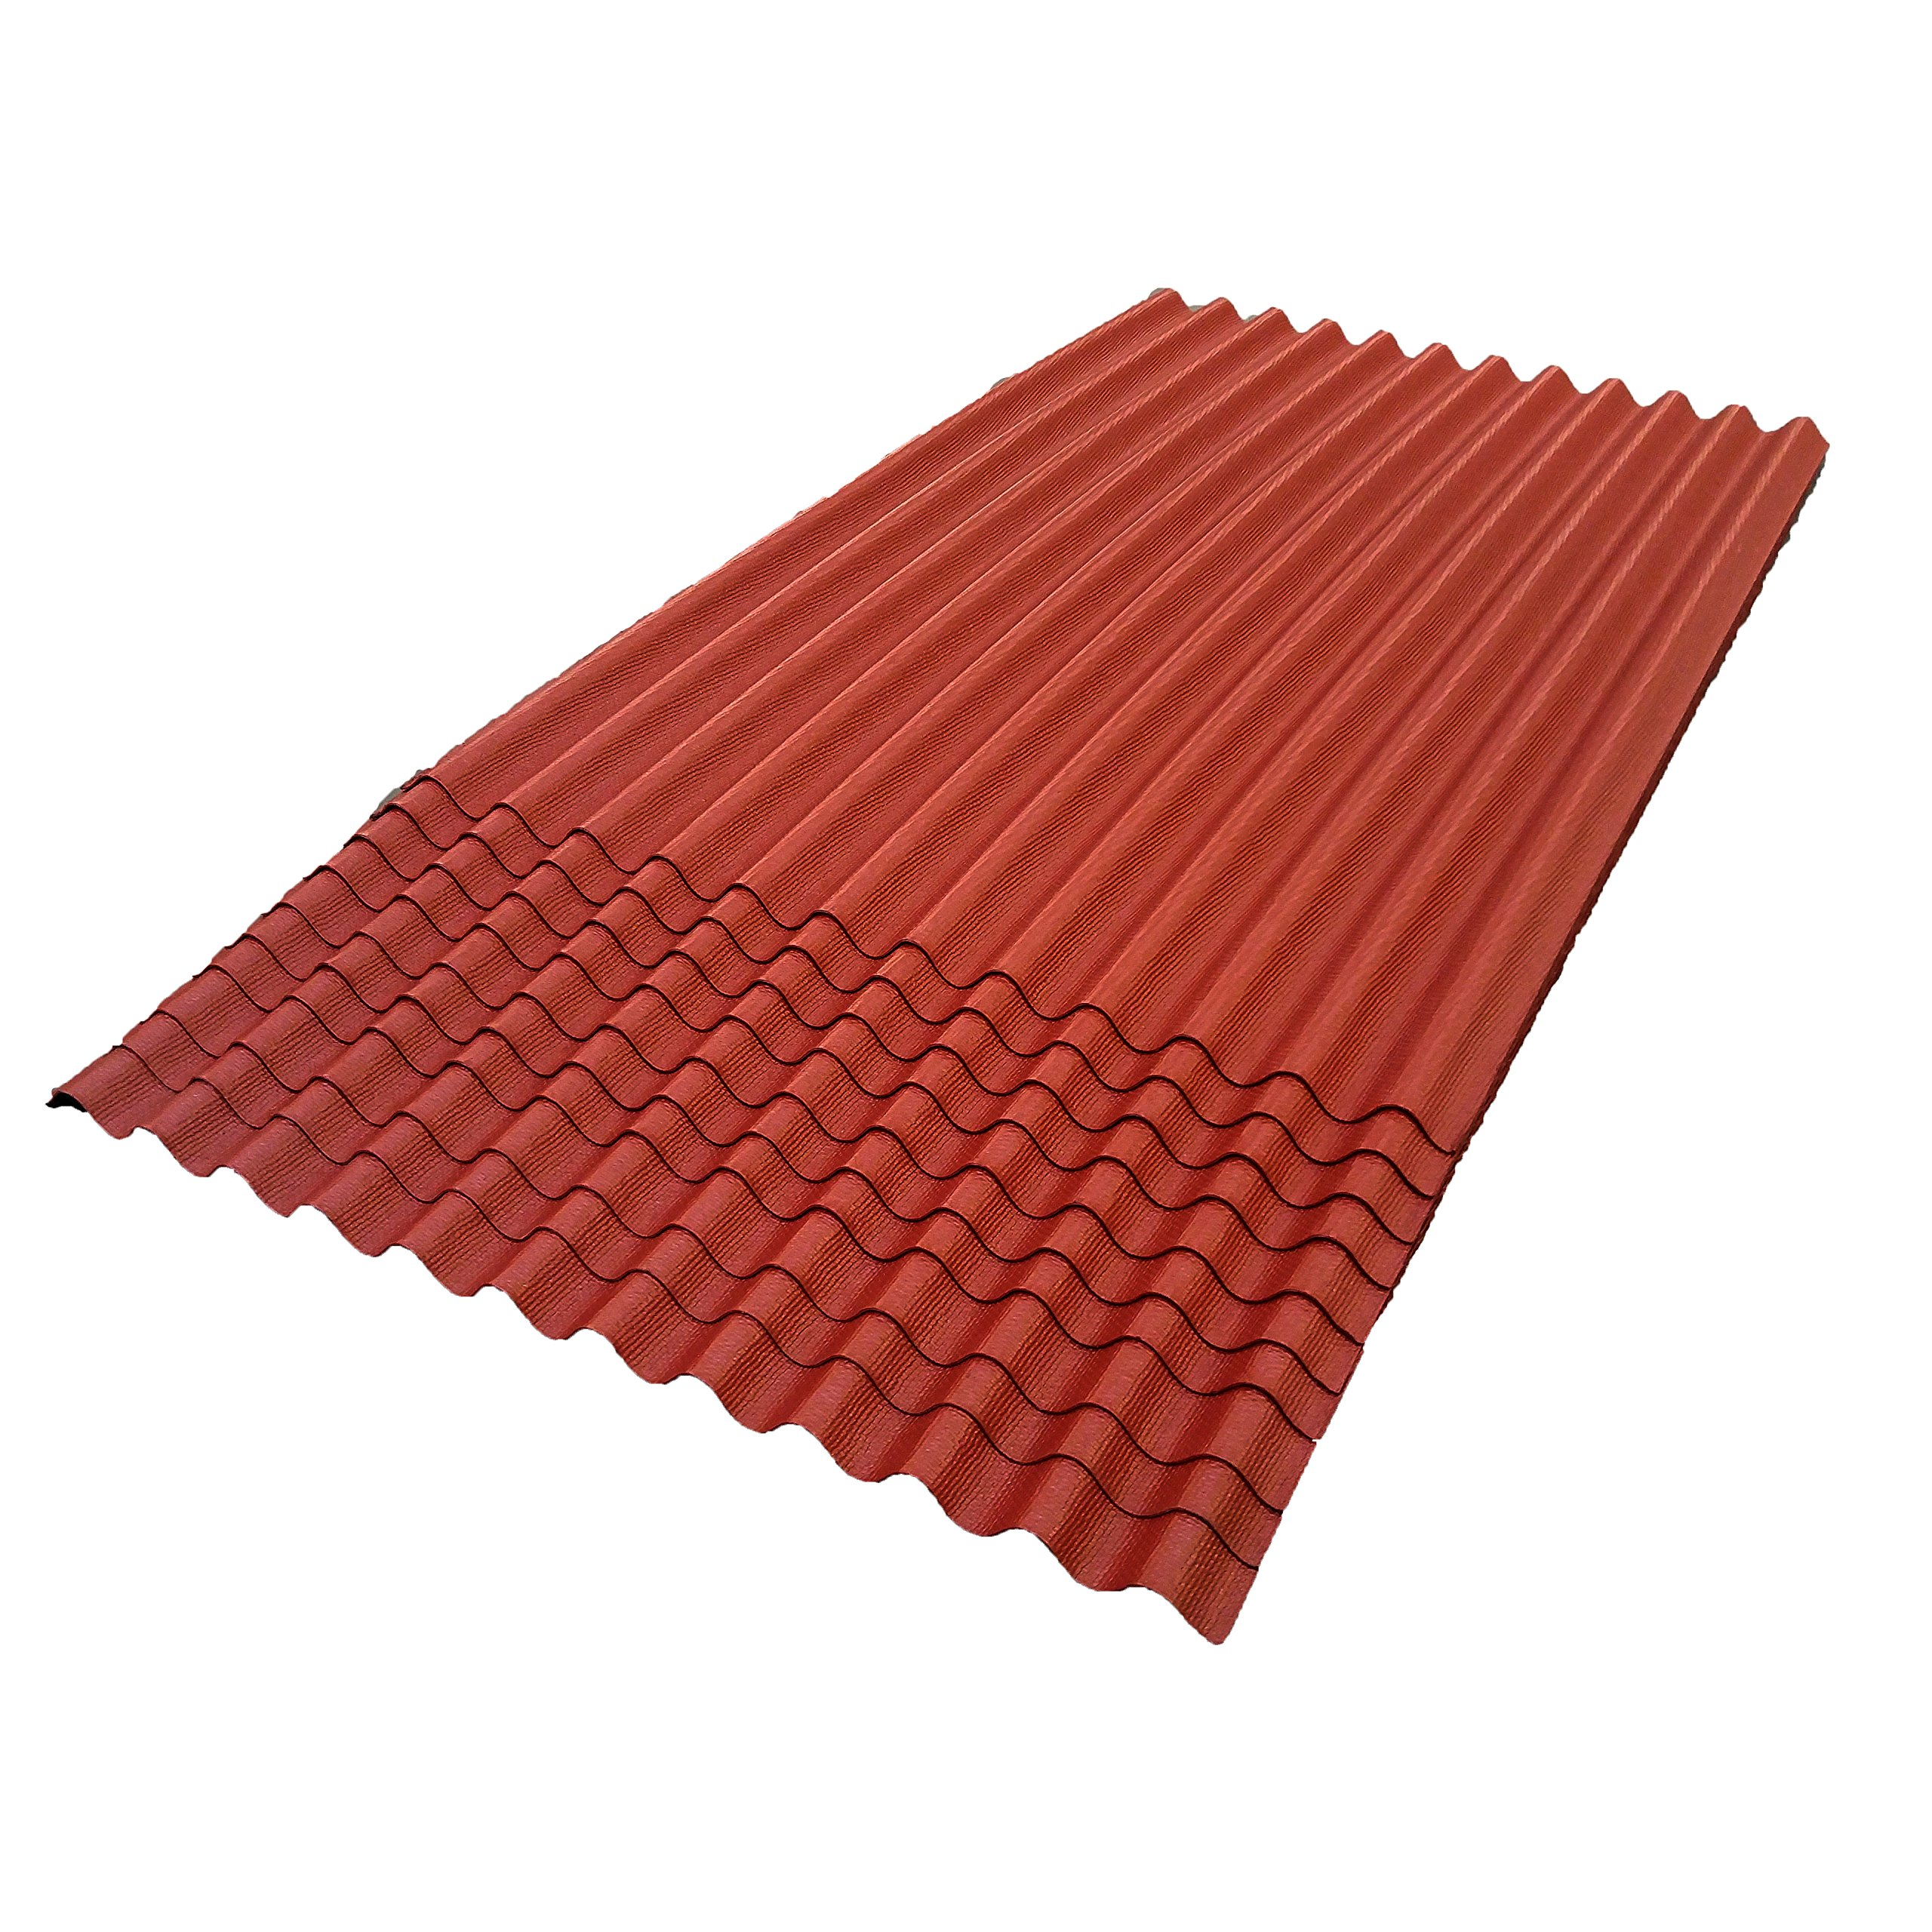 ONDURA 103 Corrugated Asphalt Roofing (10 Pack), Red by ONDURA